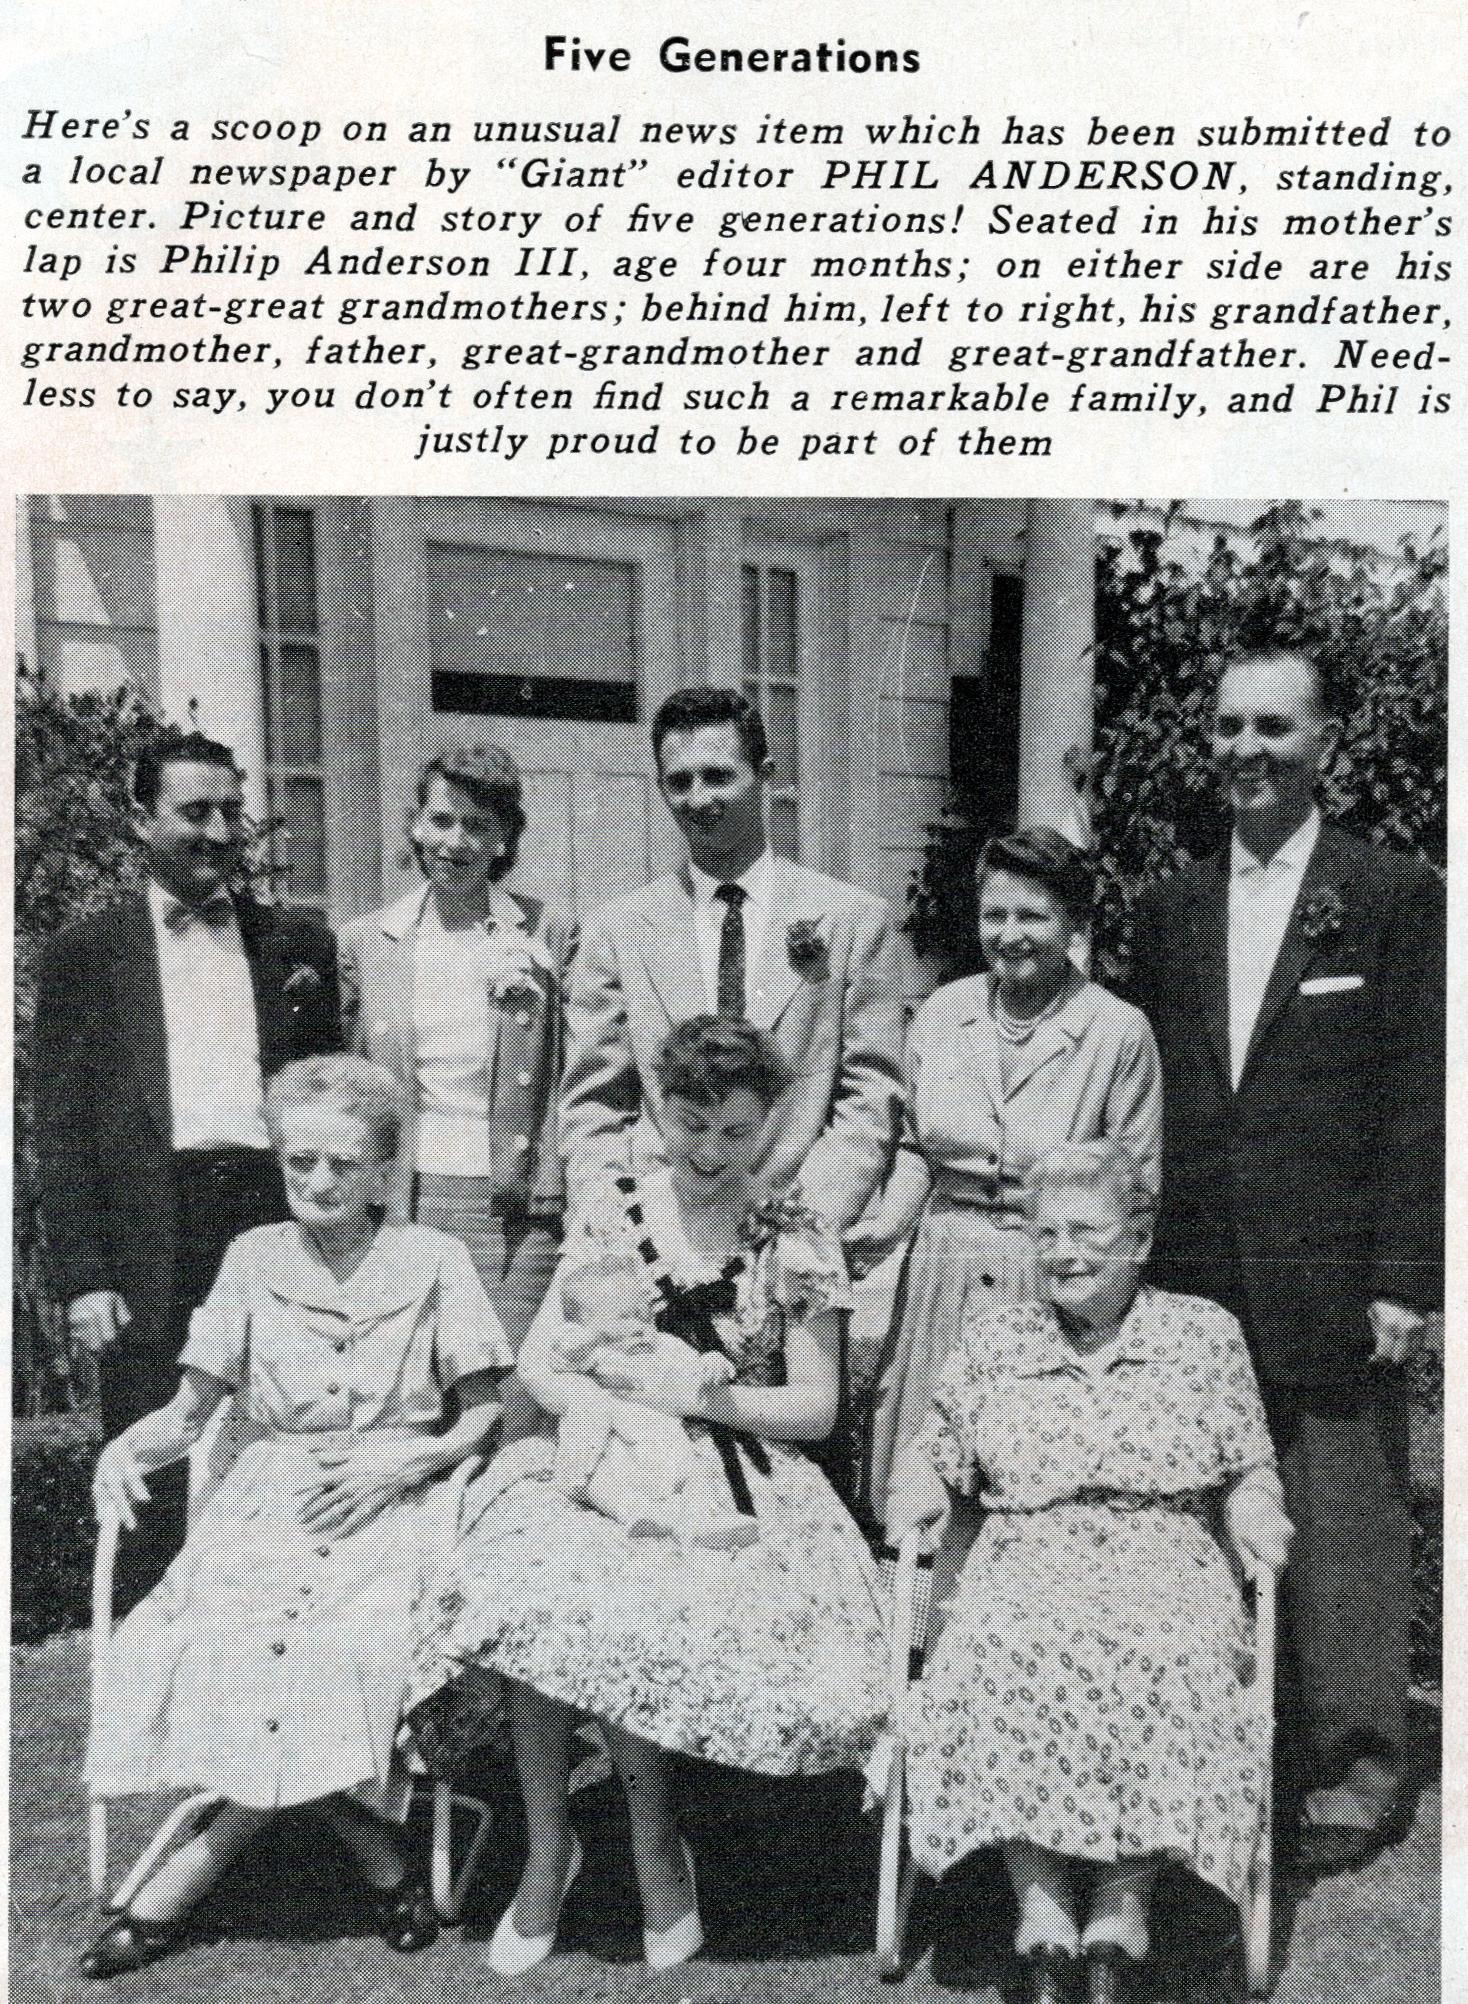 5 Generations - Warner Club News - 1956